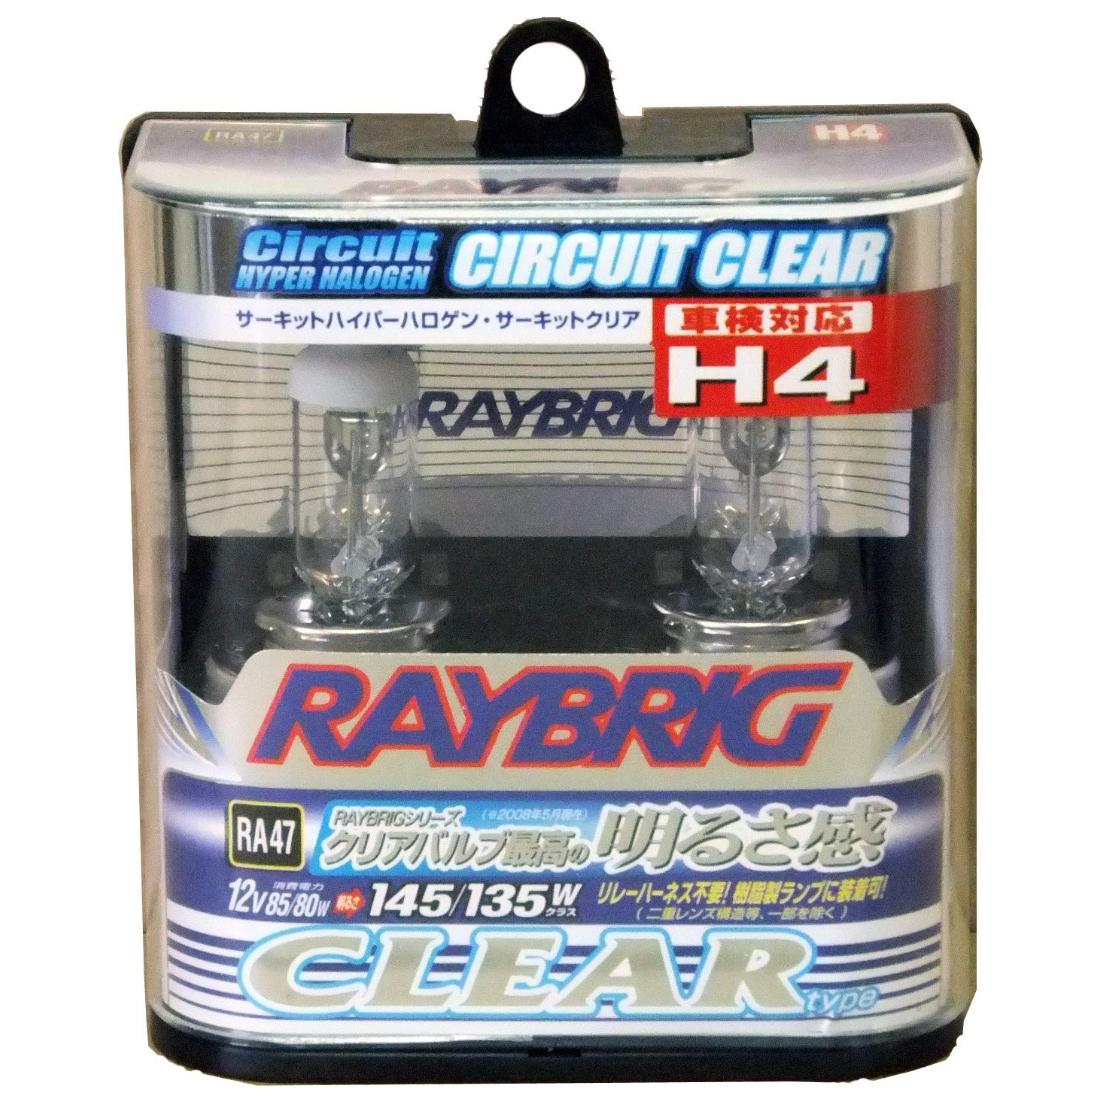 RAYBRIG  ハイパーハロゲン・サーキットクリア [ 3300K ] RA47 [ 2個入り ]